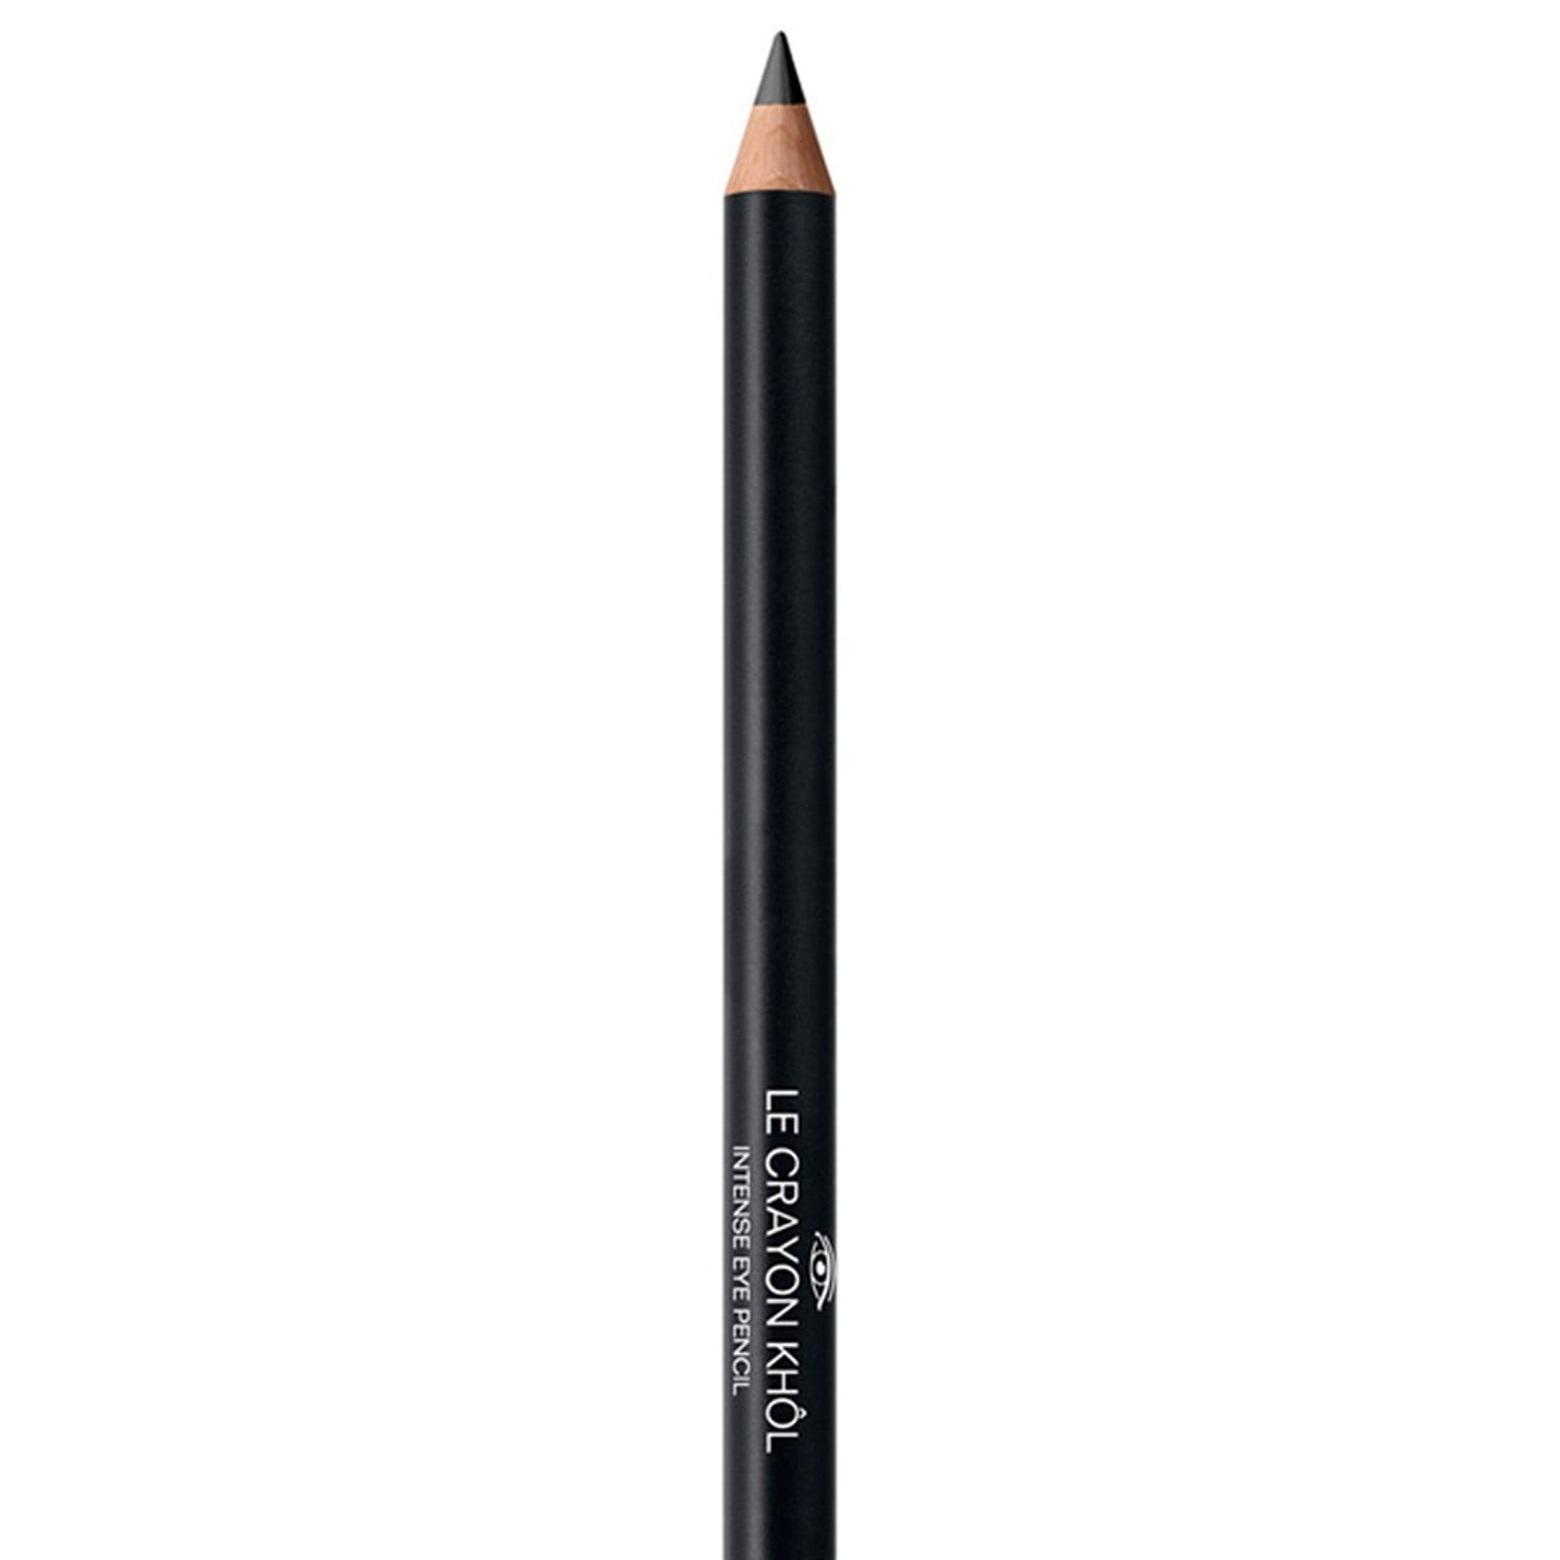 Chanel Le Crayon  Khôl, $30